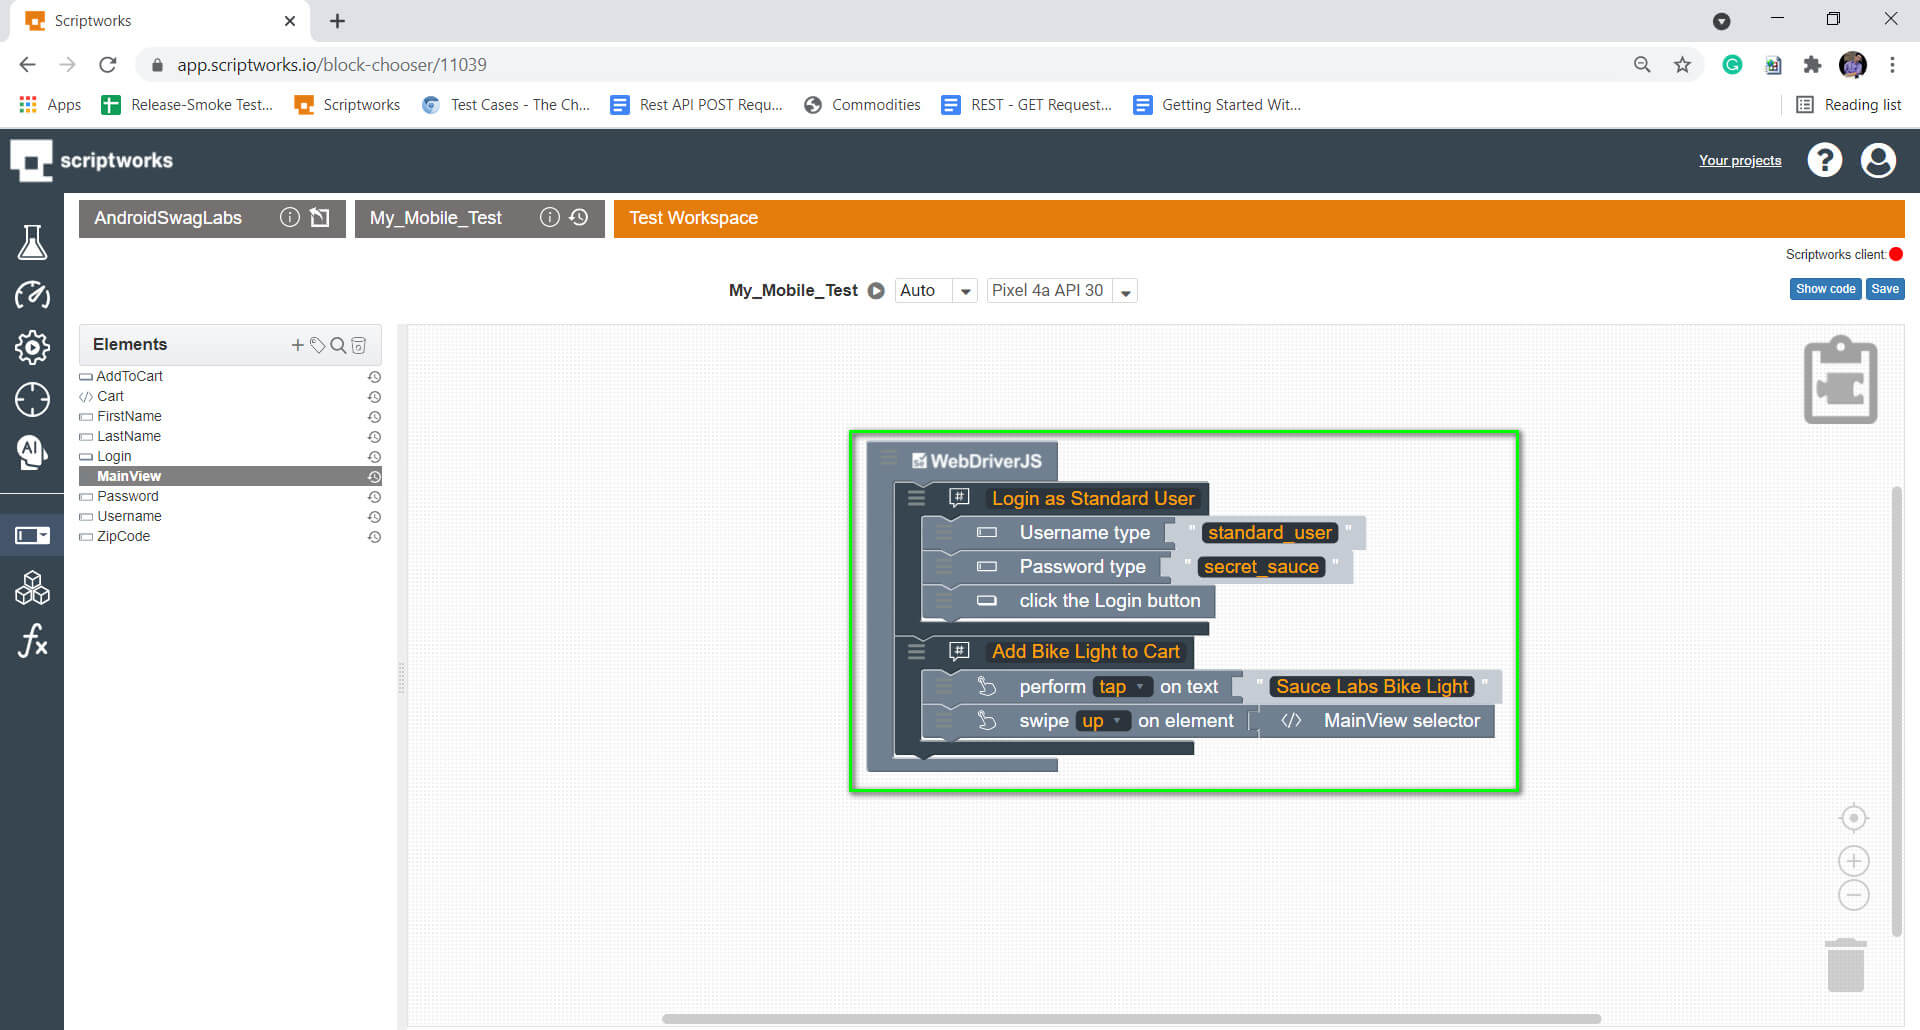 Screenshot of attach mainview in swipe up blokc